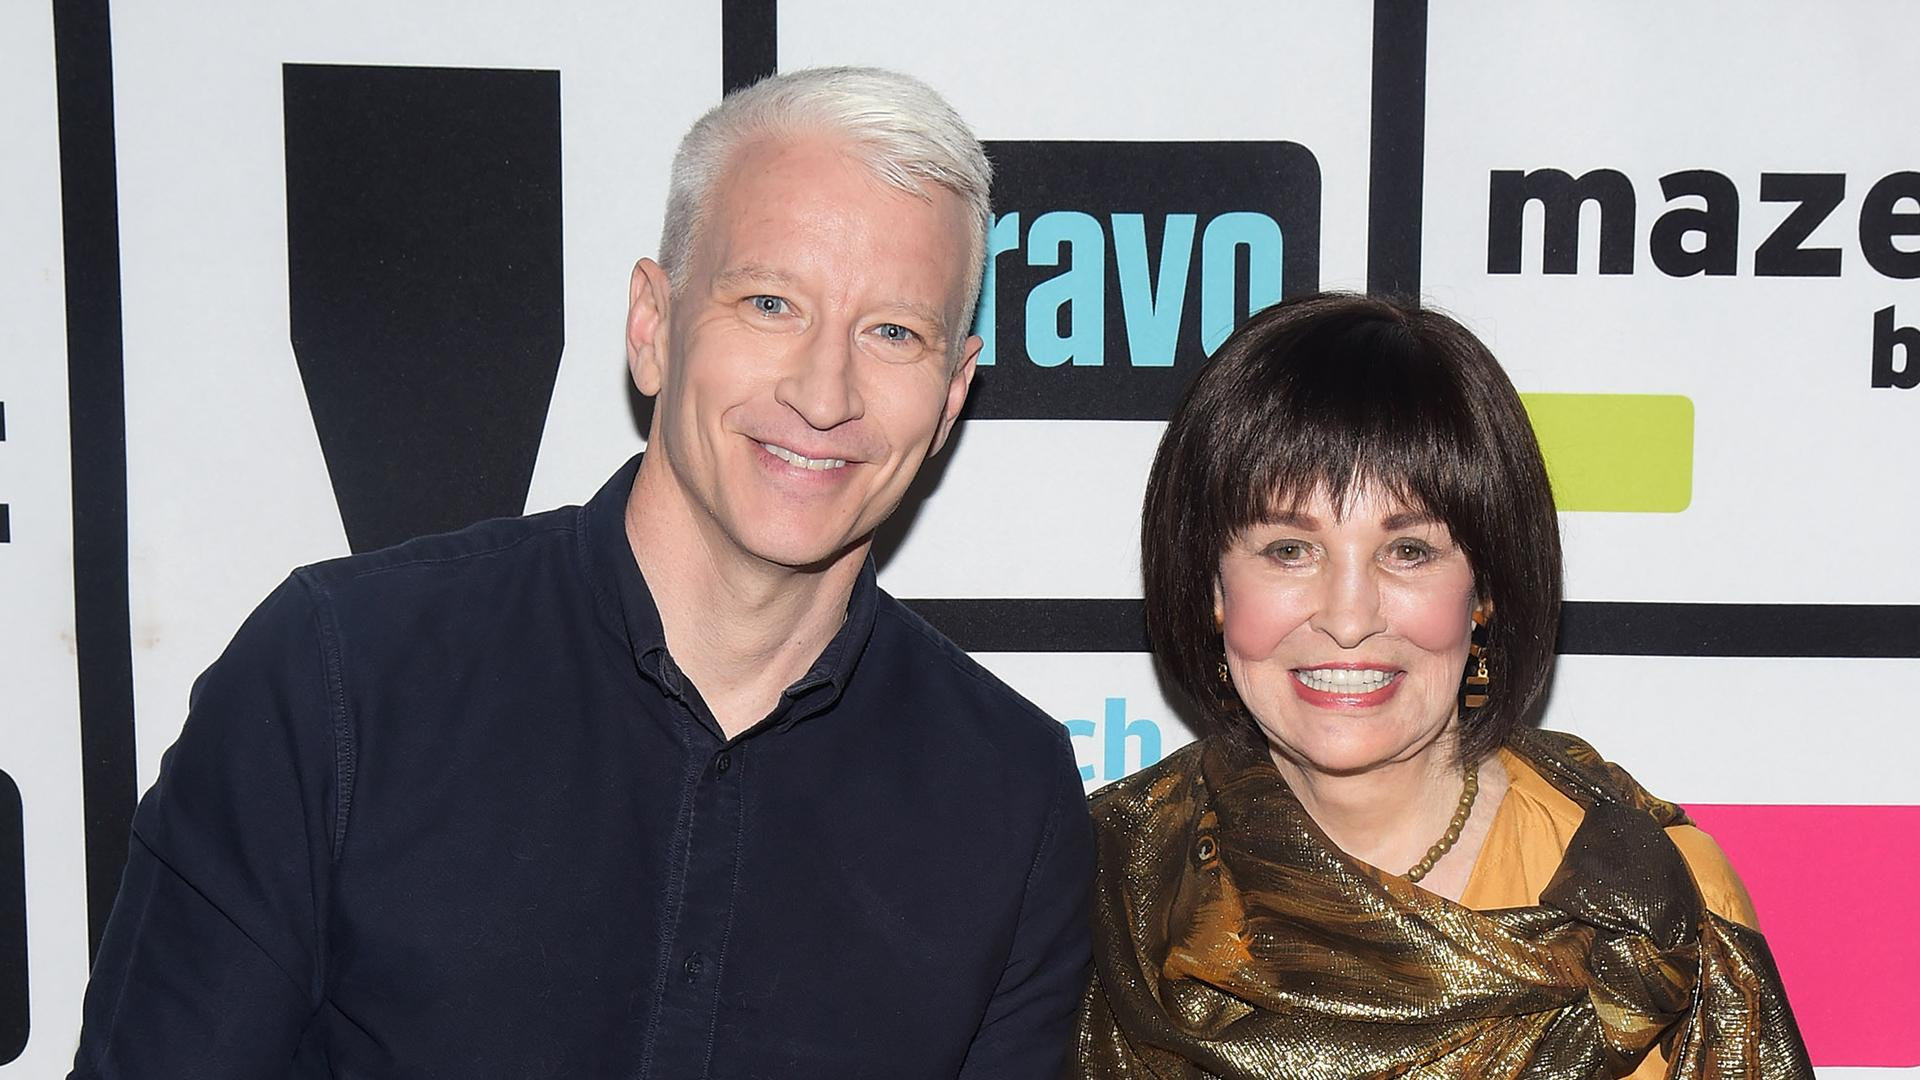 Inside Anderson Cooper and Gloria Vanderbilt's Unconventional Mother